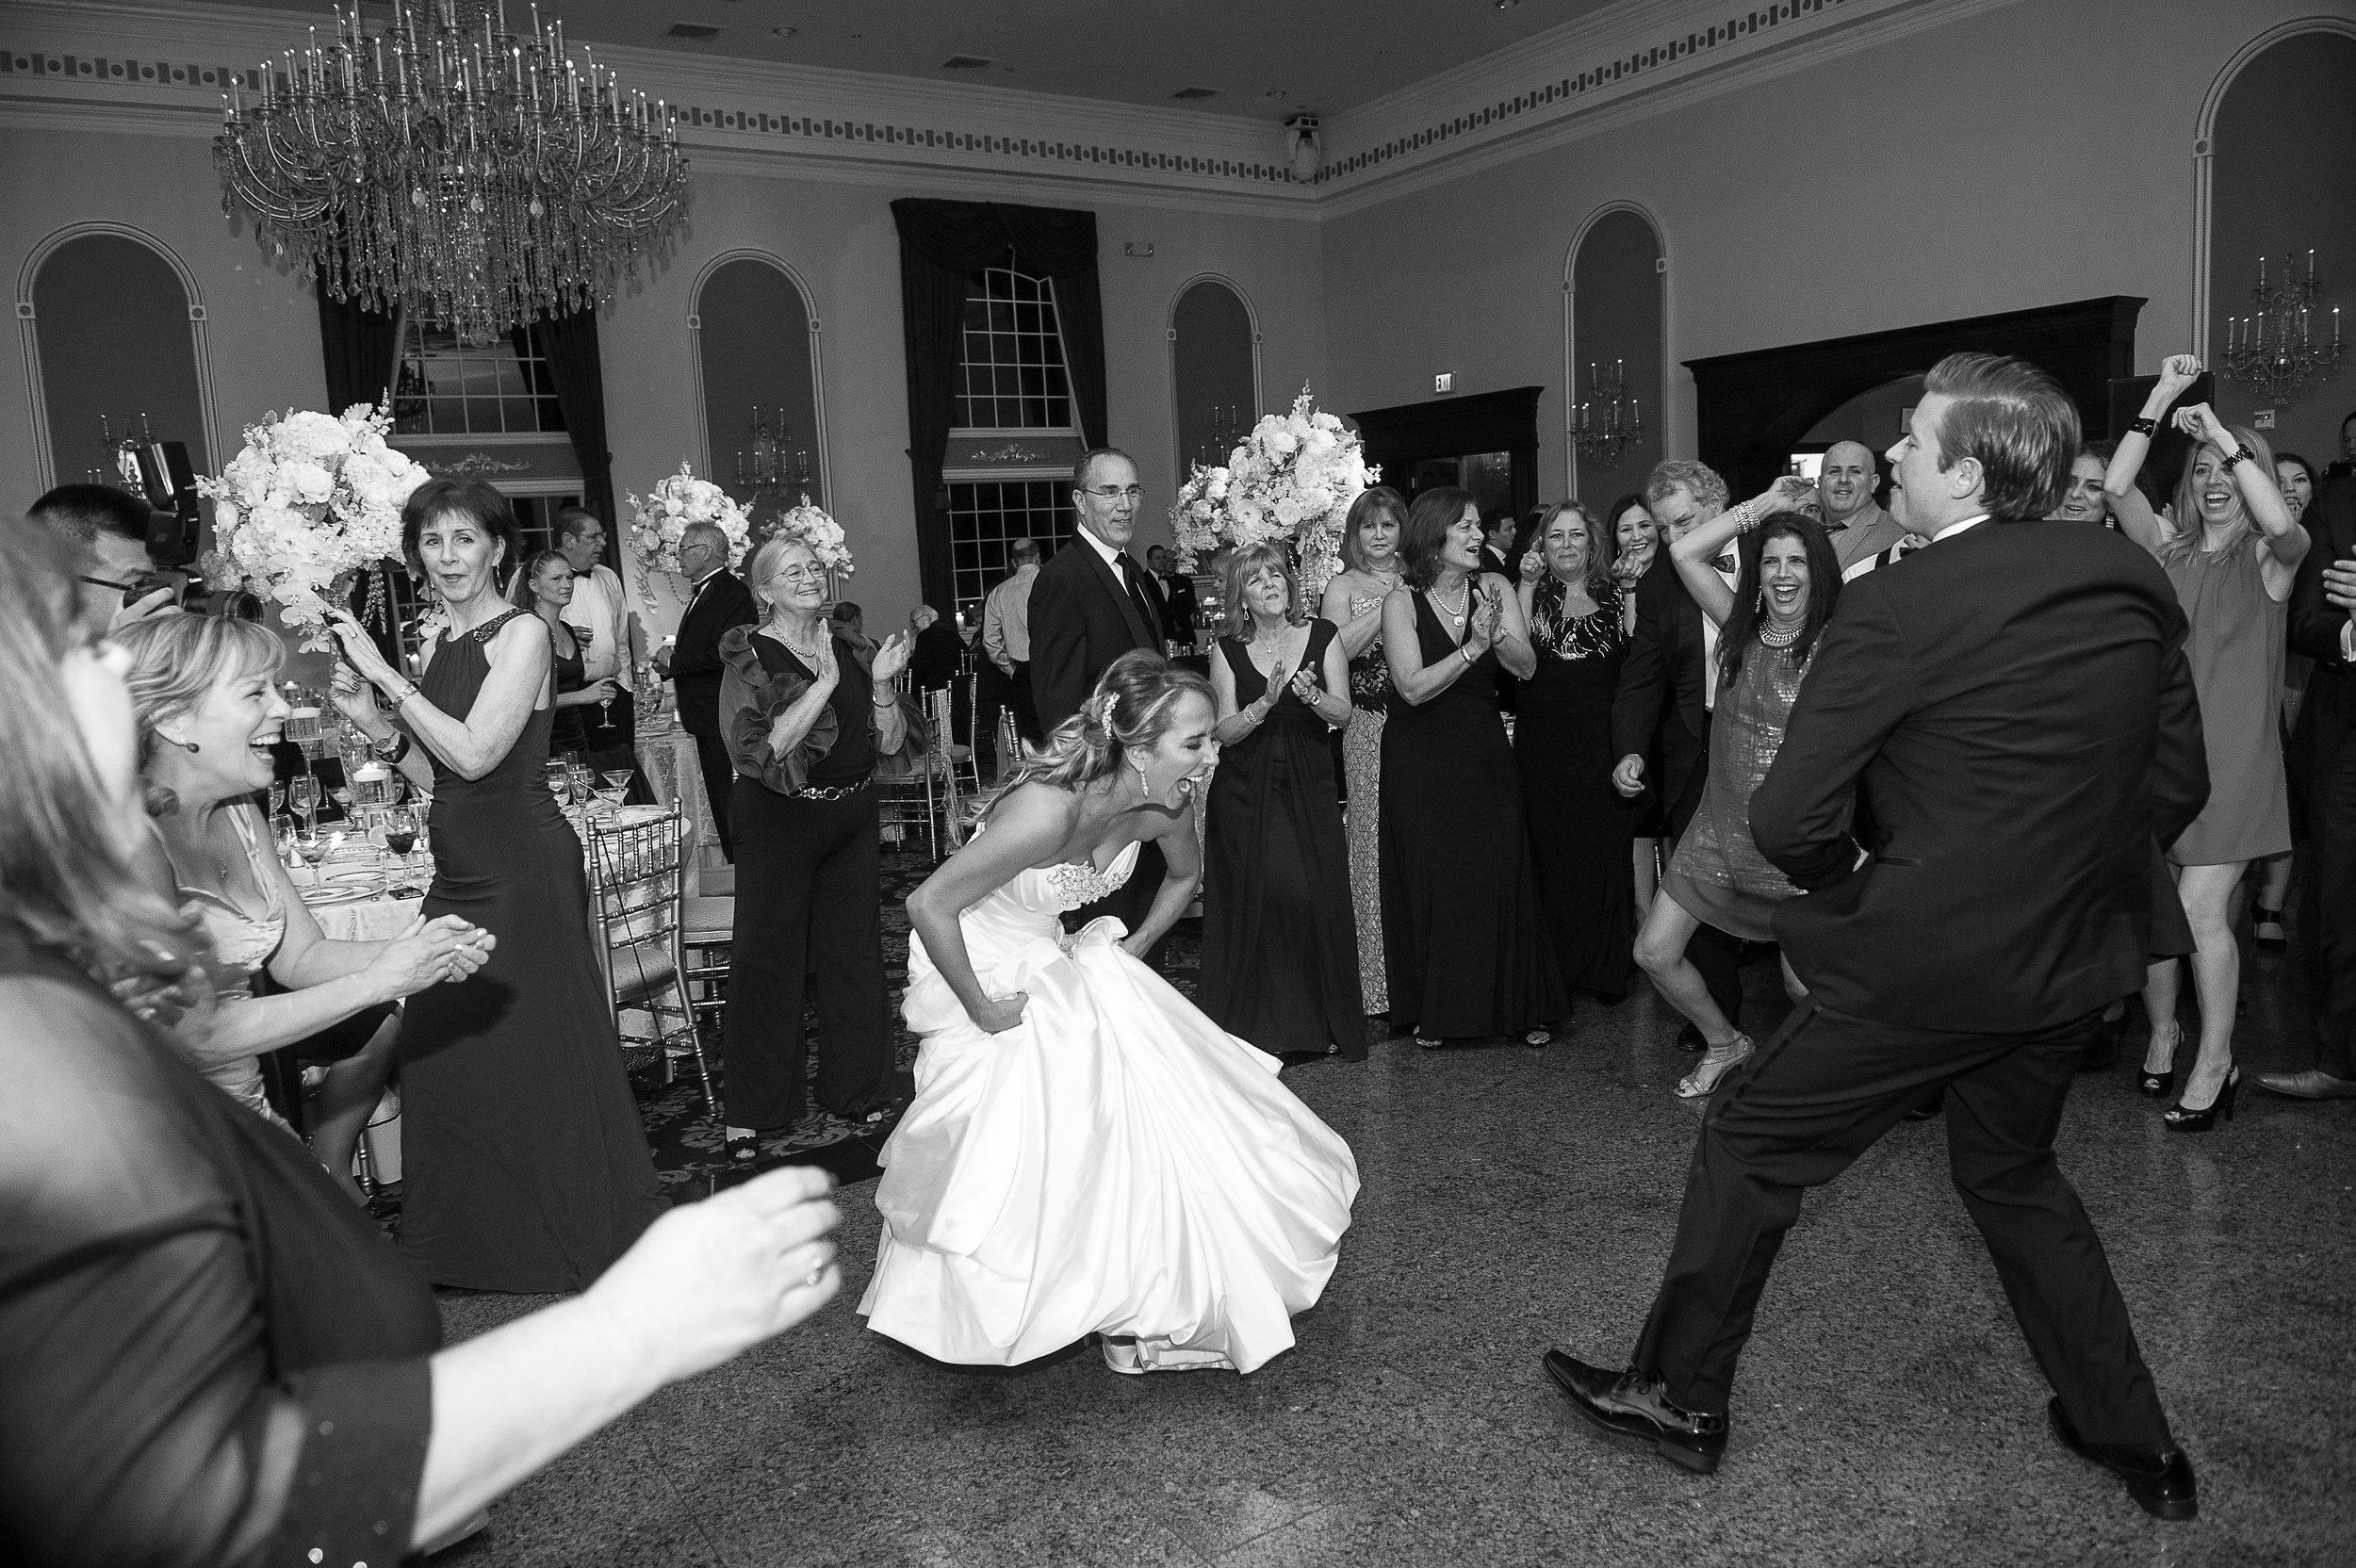 Ceci_New_York_Custom_Invitation_ New_Jersey_Wedding_Luxury_Personalized_Ceci_Style_Bride_Foil_Stamping120.JPG